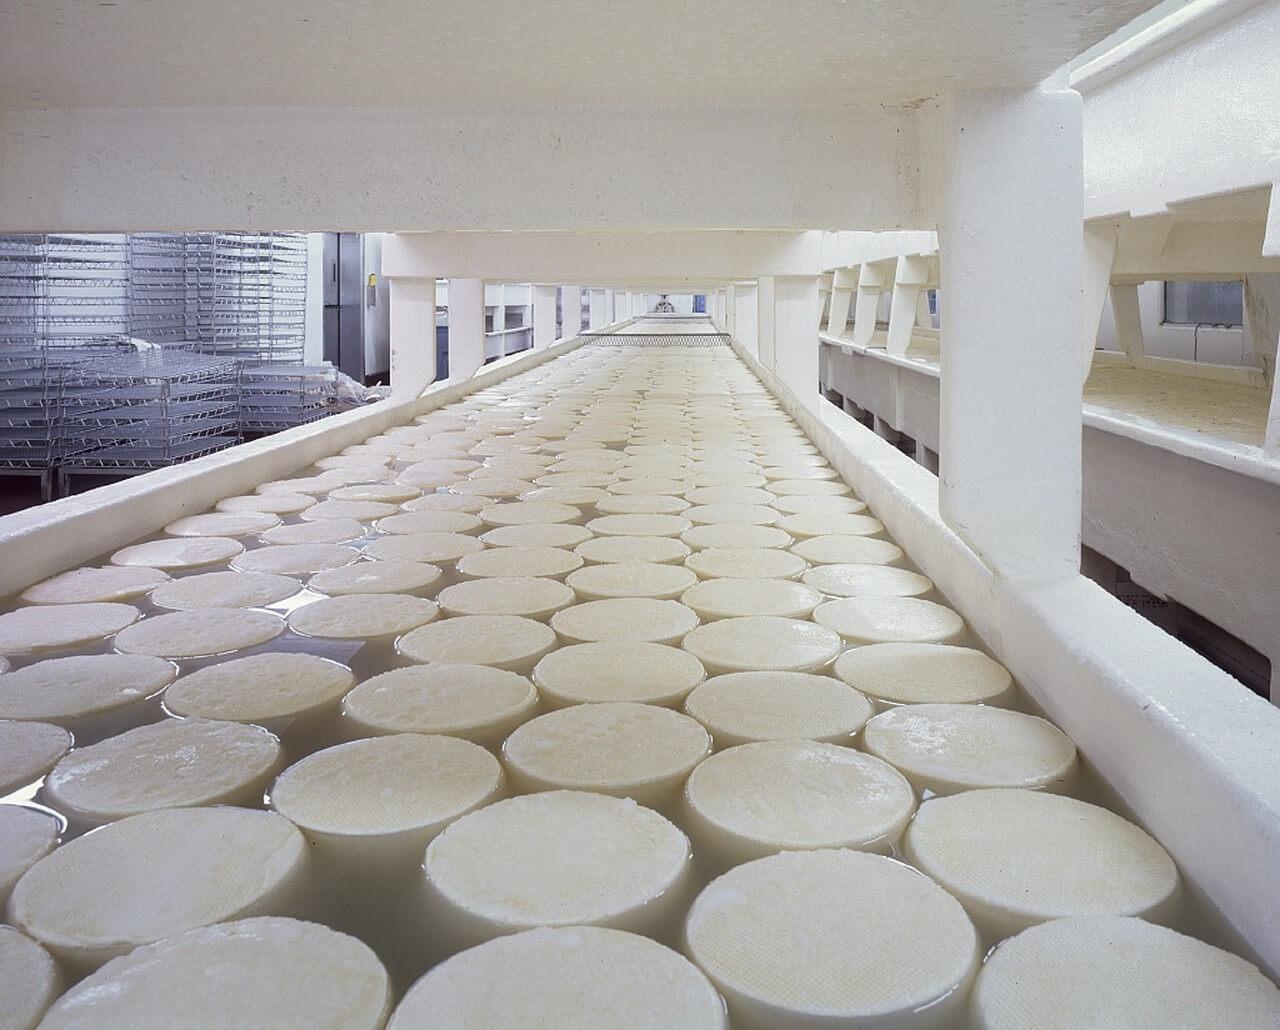 Kühlex Kühlung in der Produktion